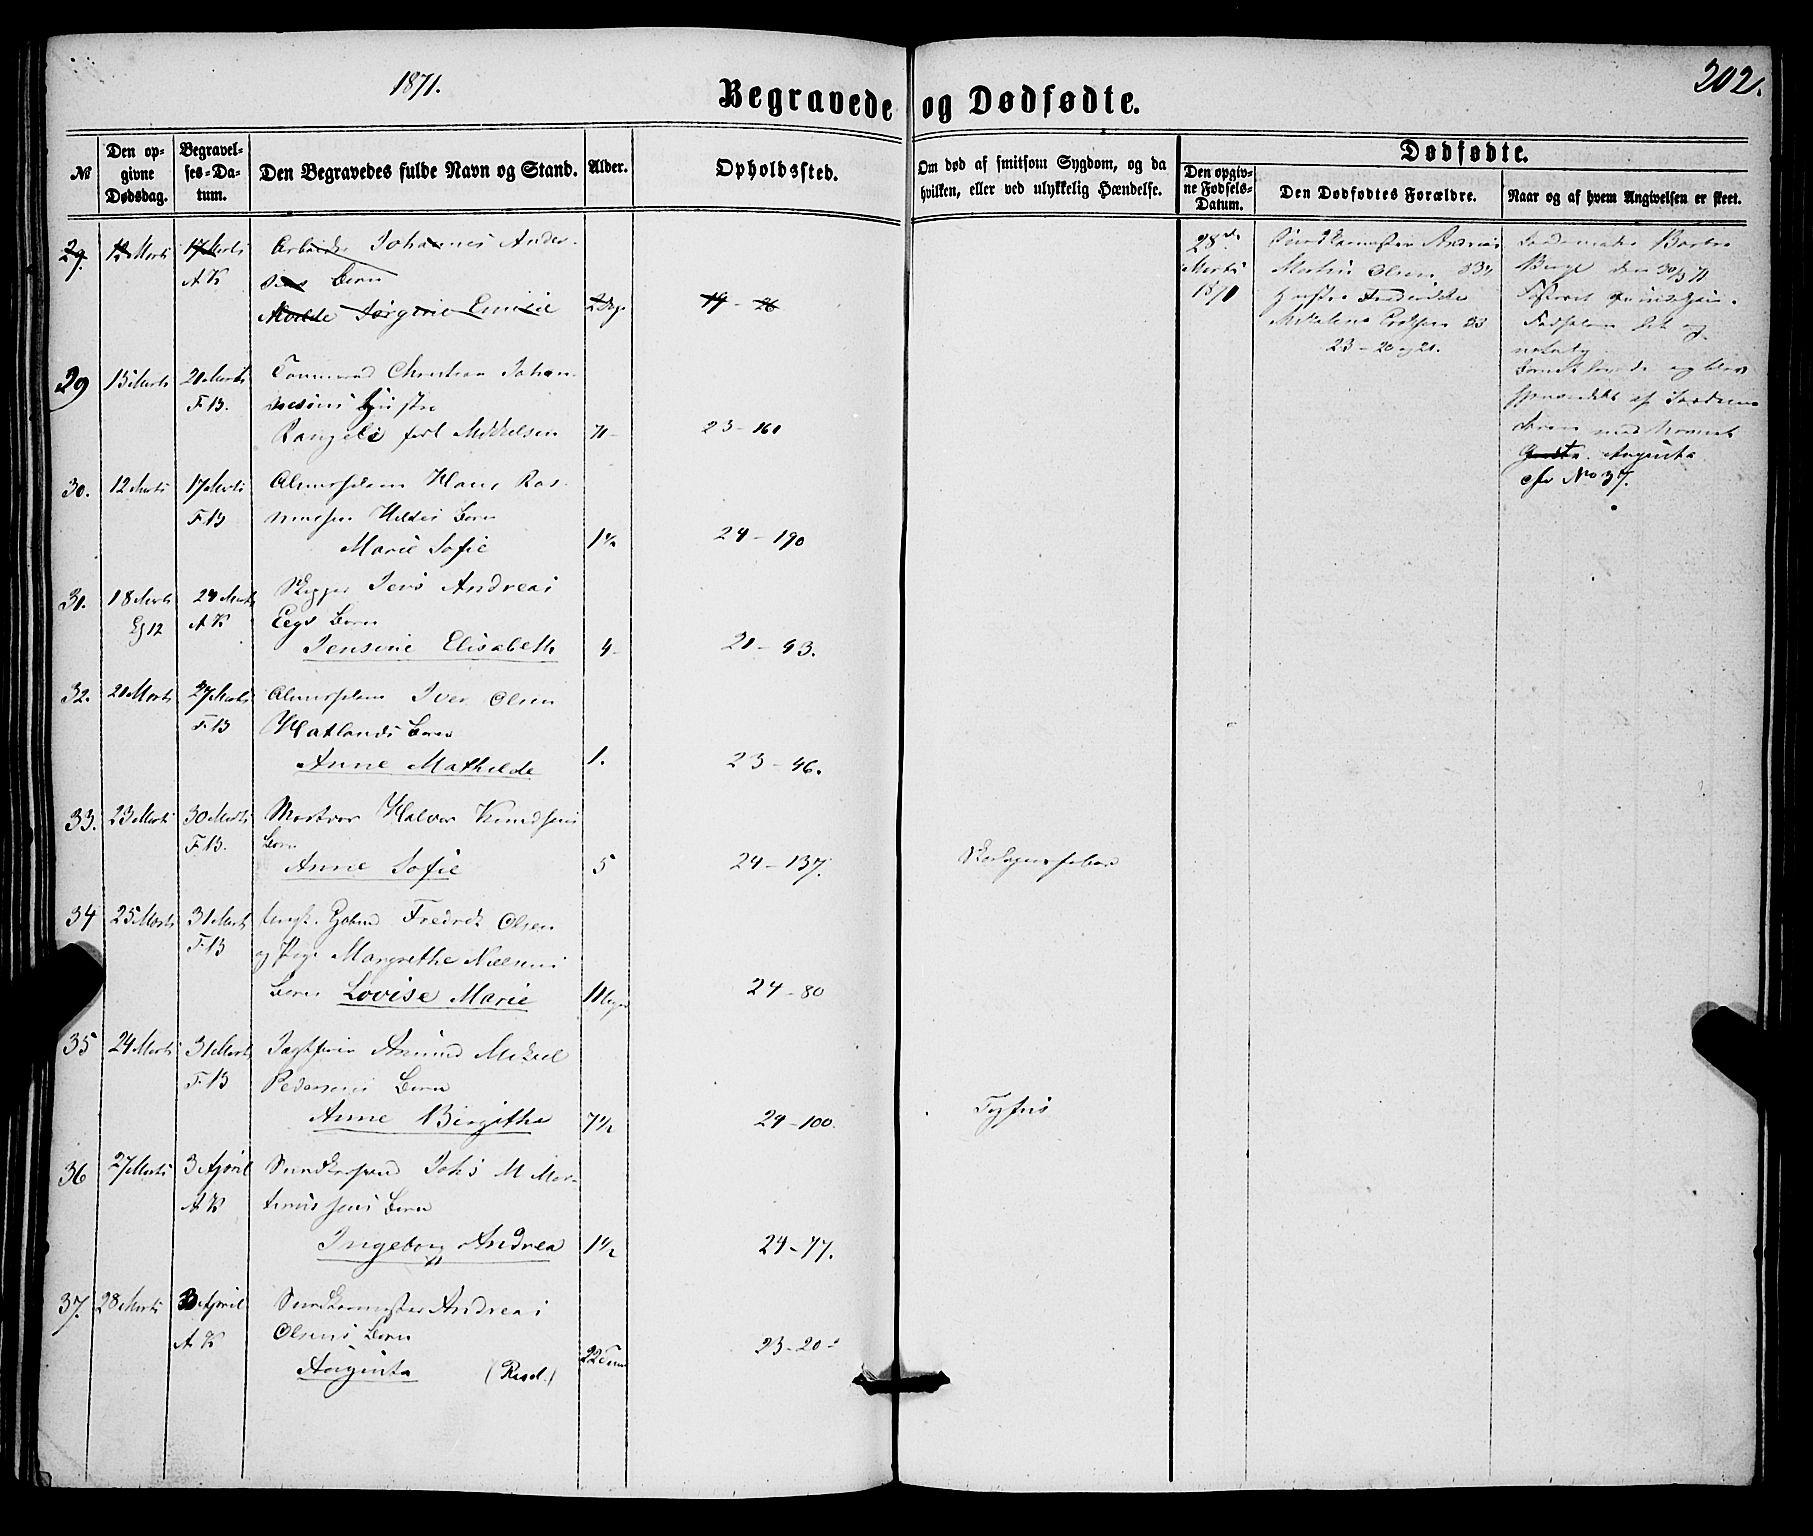 SAB, Korskirken Sokneprestembete, H/Haa/L0045: Ministerialbok nr. E 3, 1863-1875, s. 202